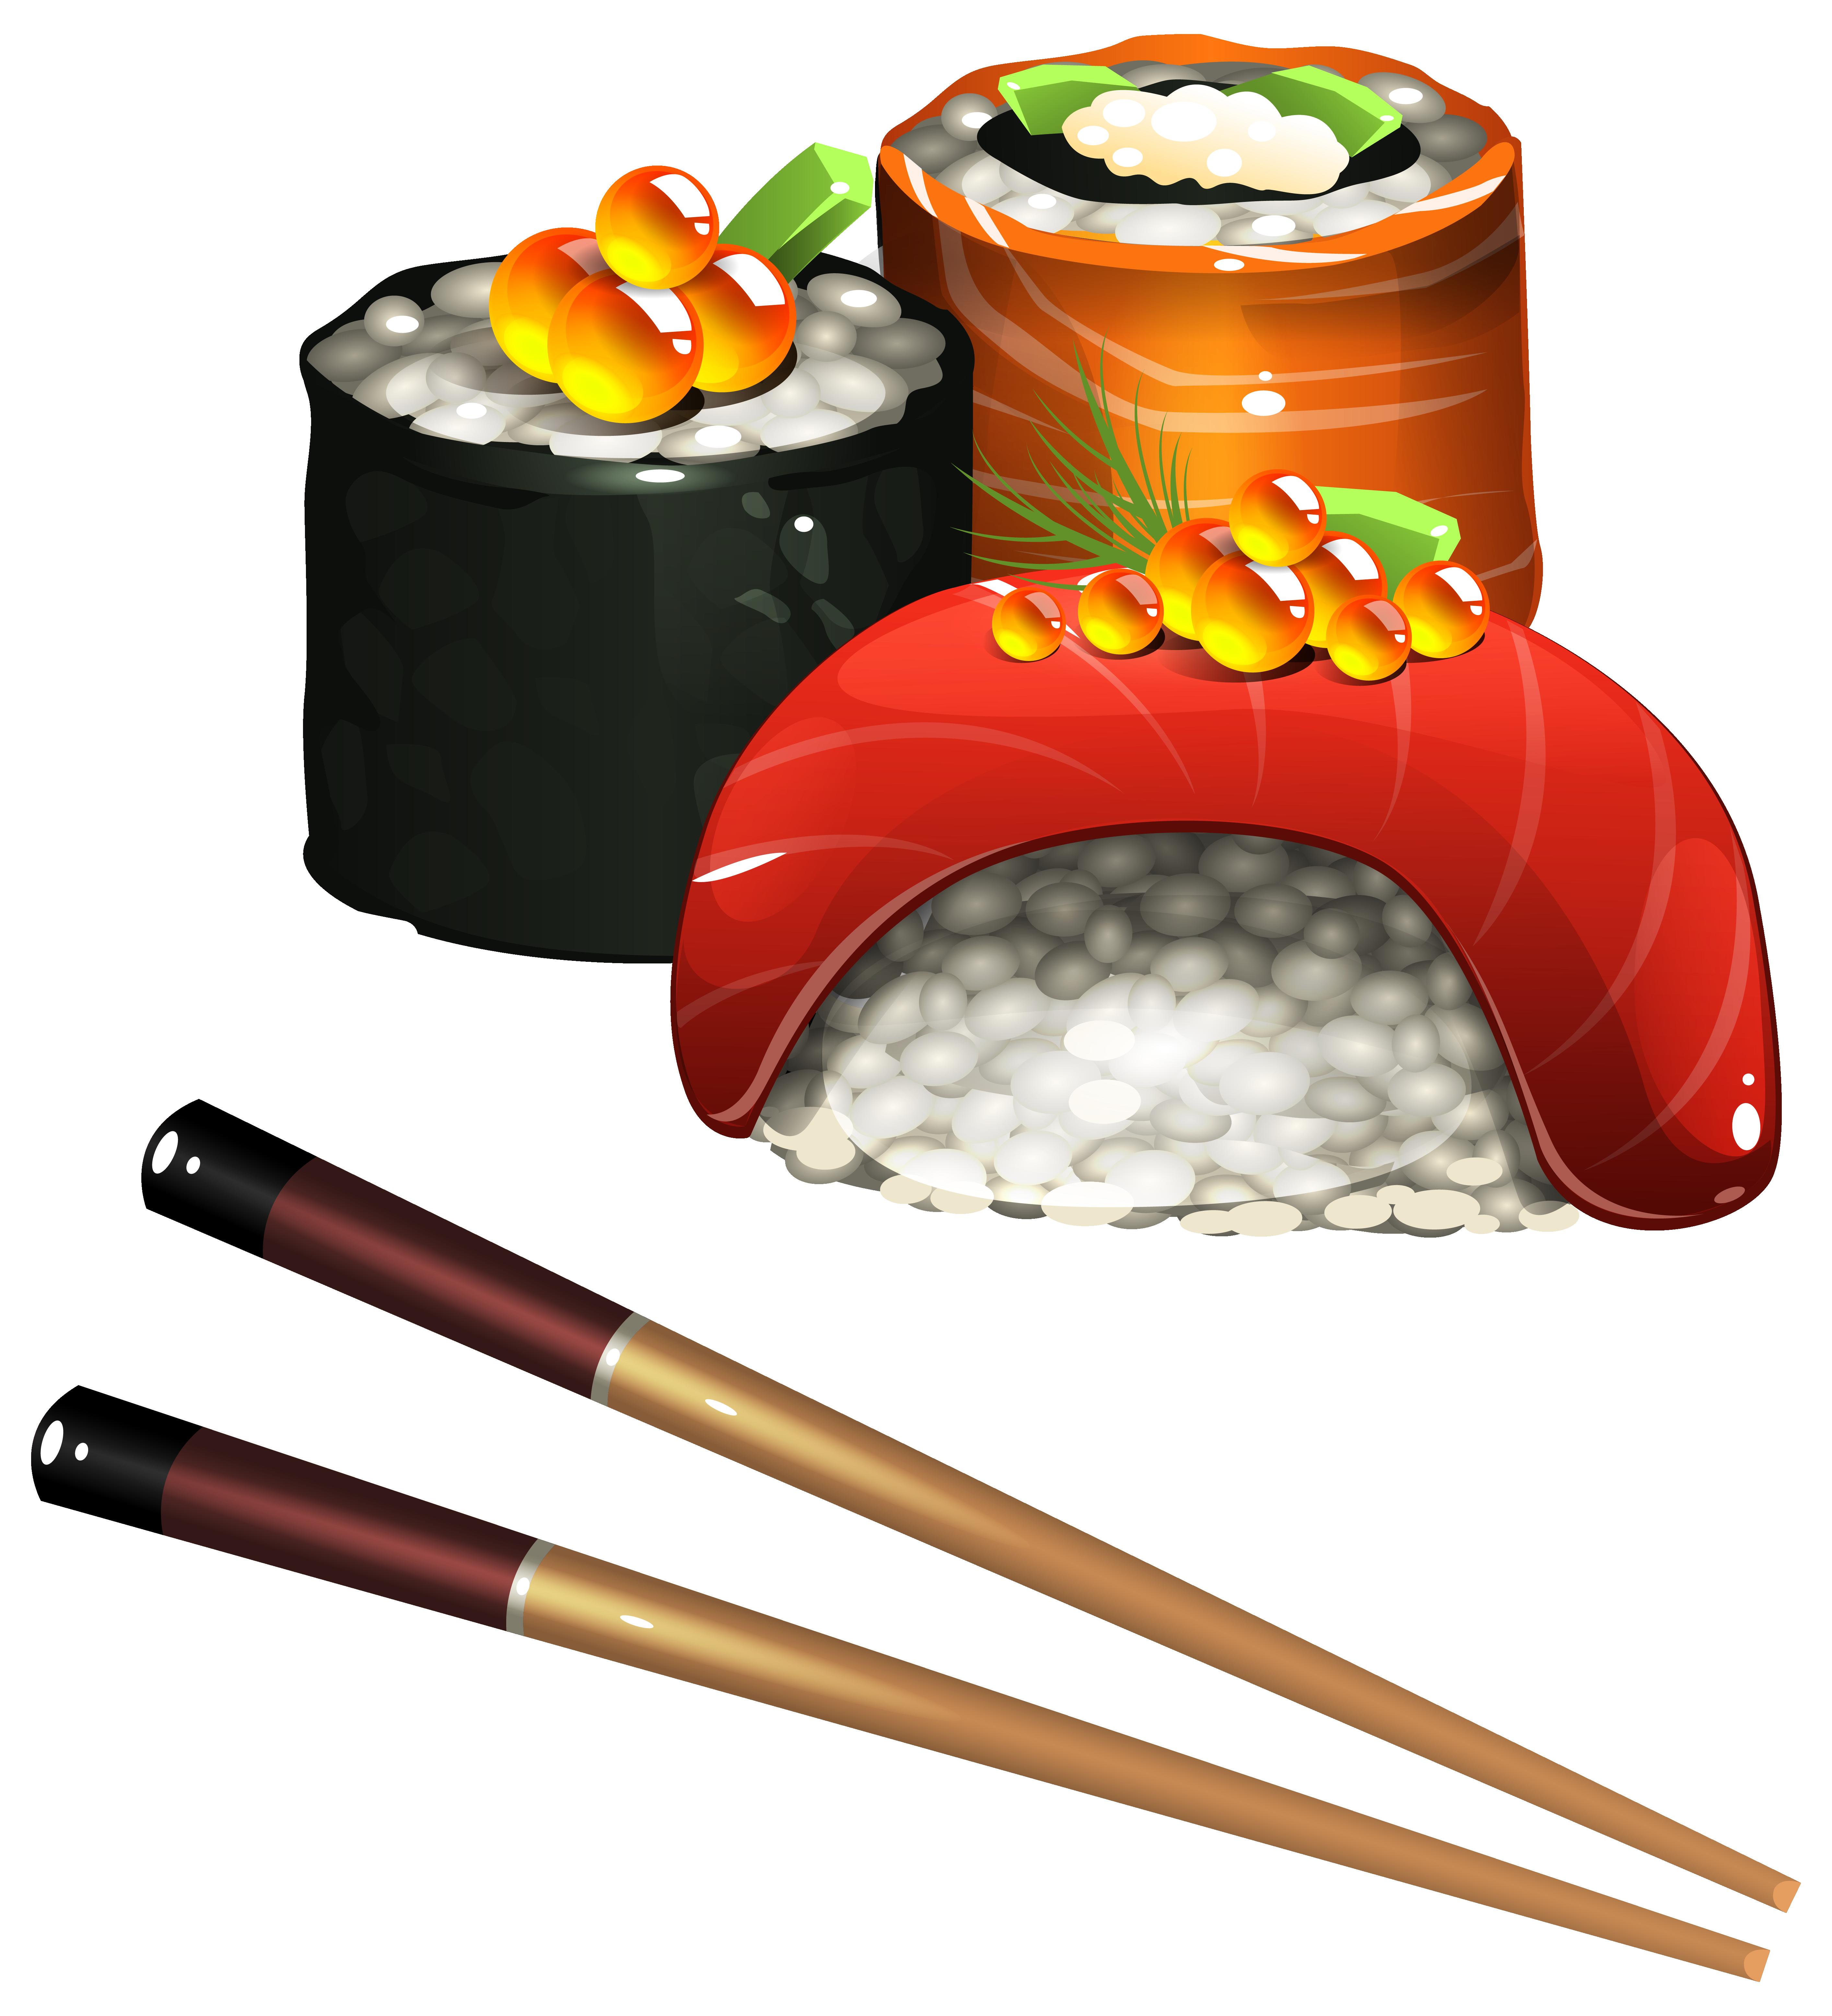 image transparent stock Sushi Set PNG Clipart Image